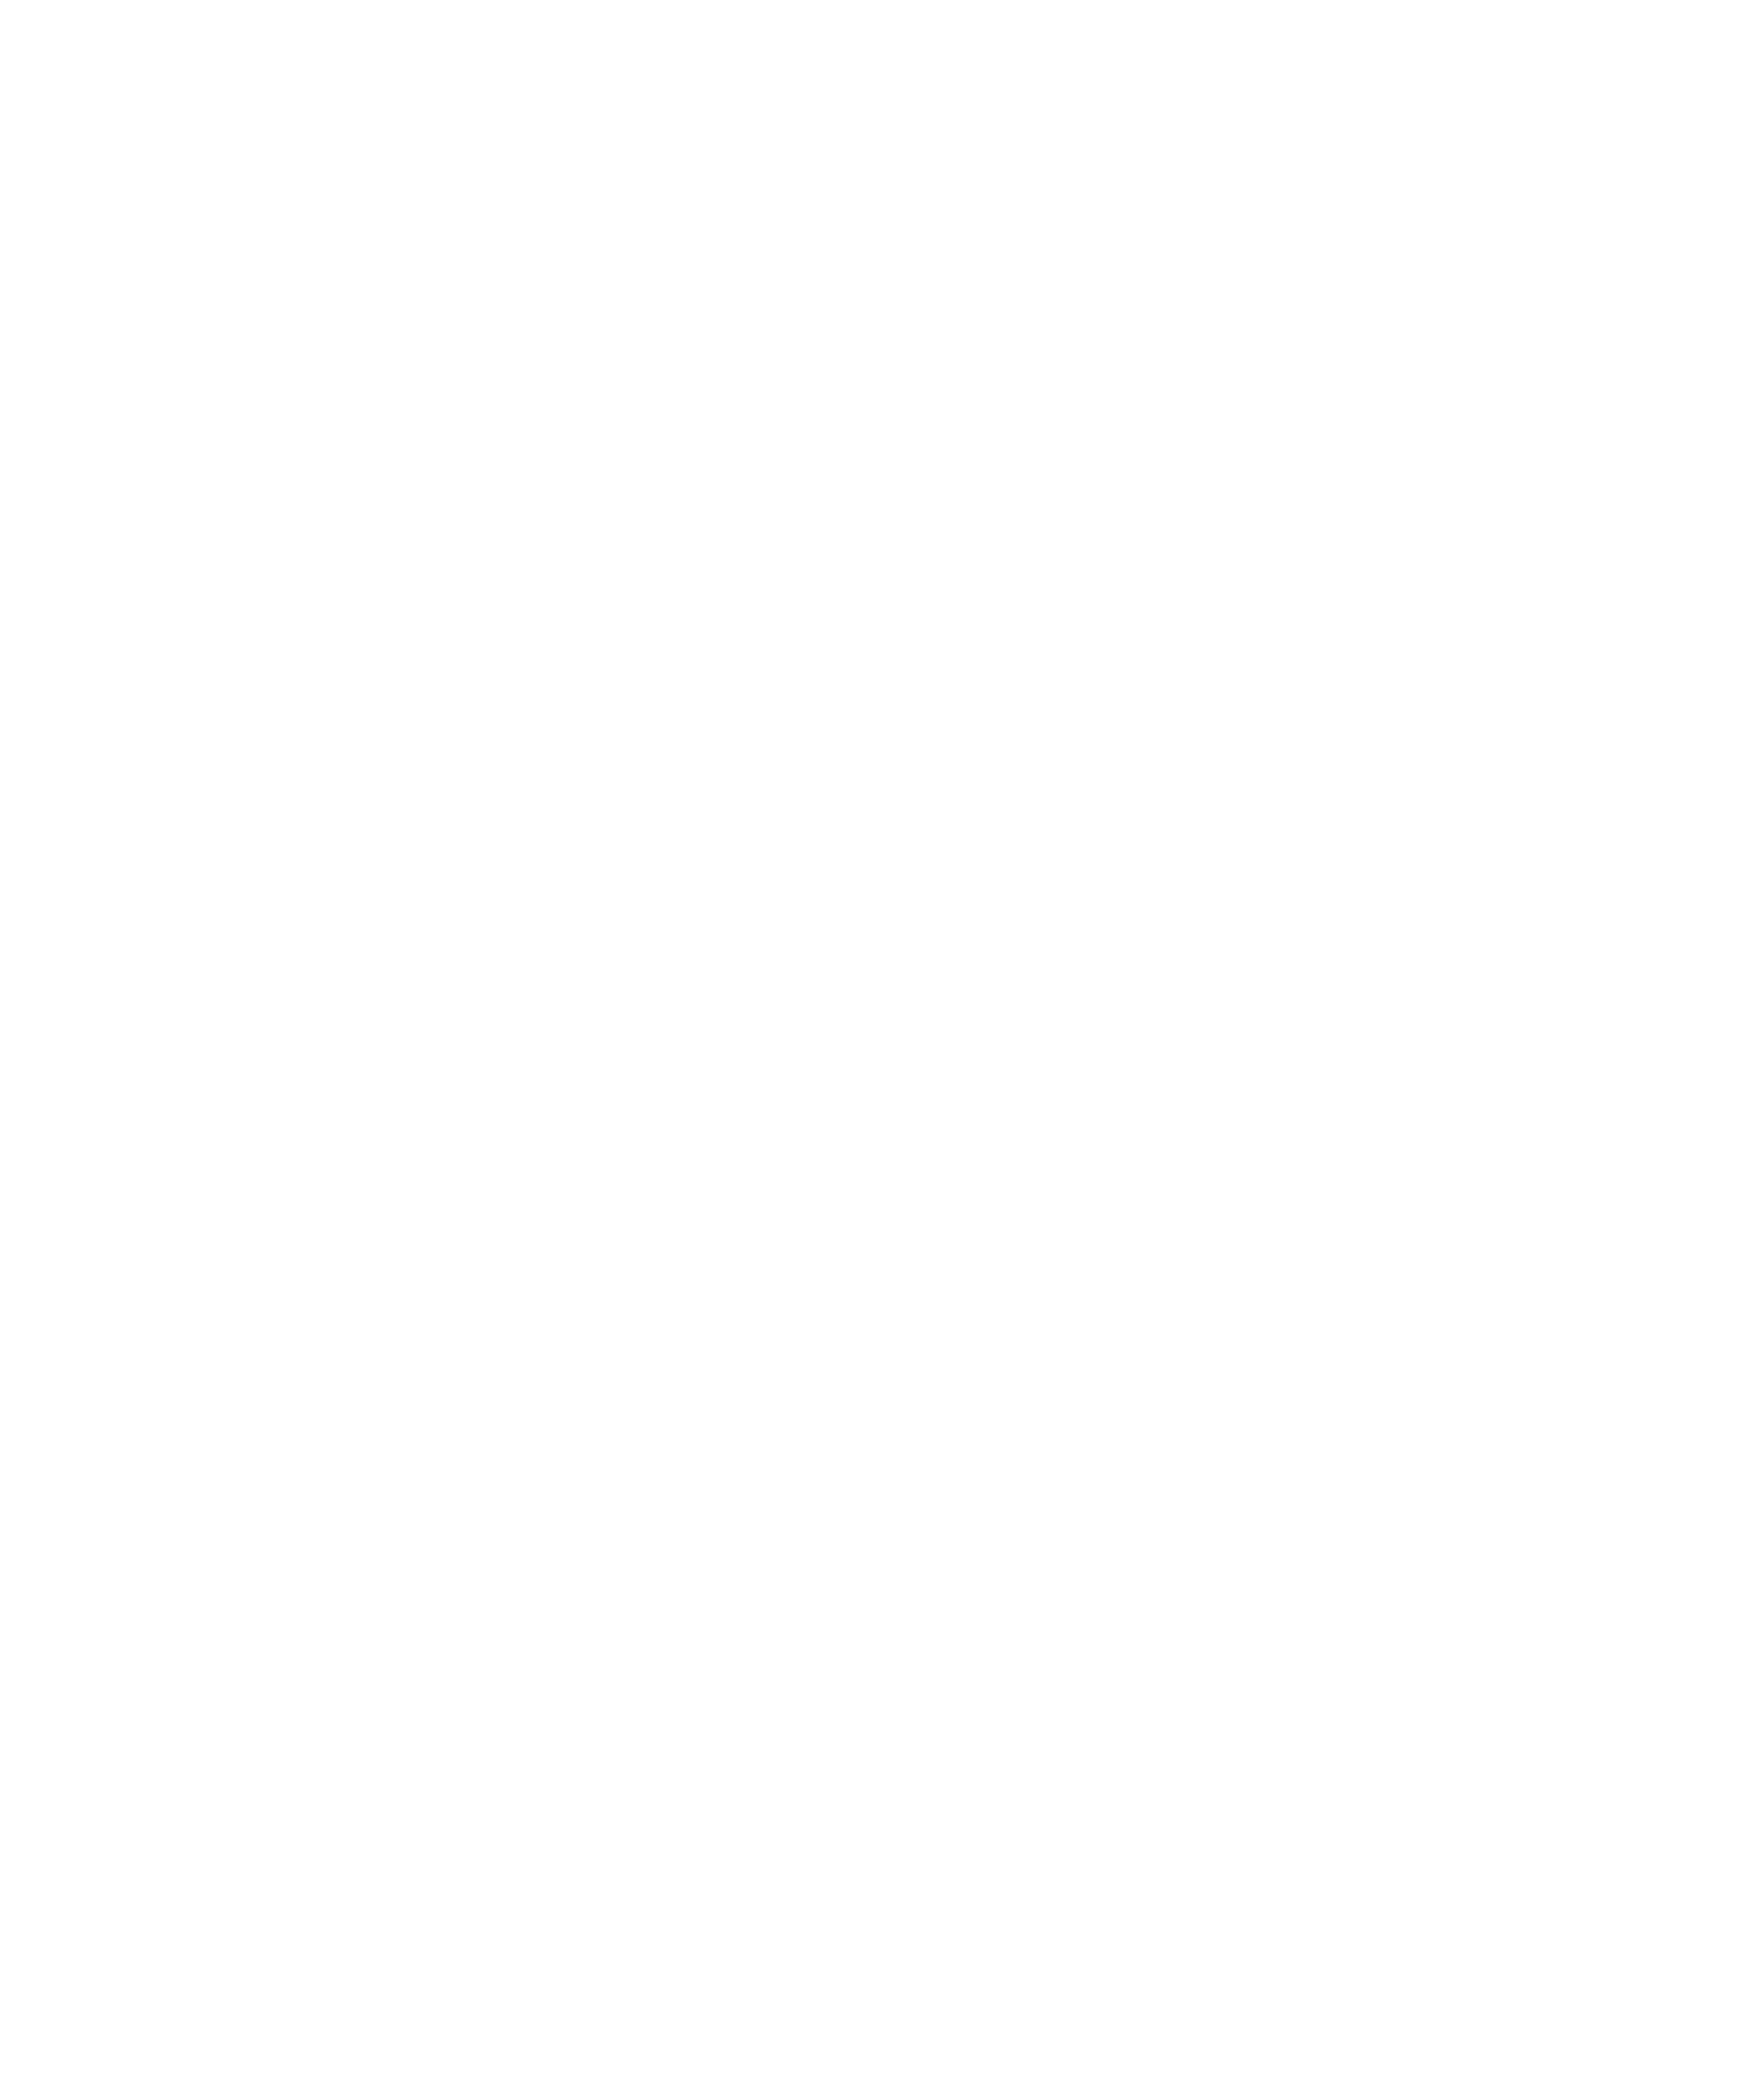 QubeProduction